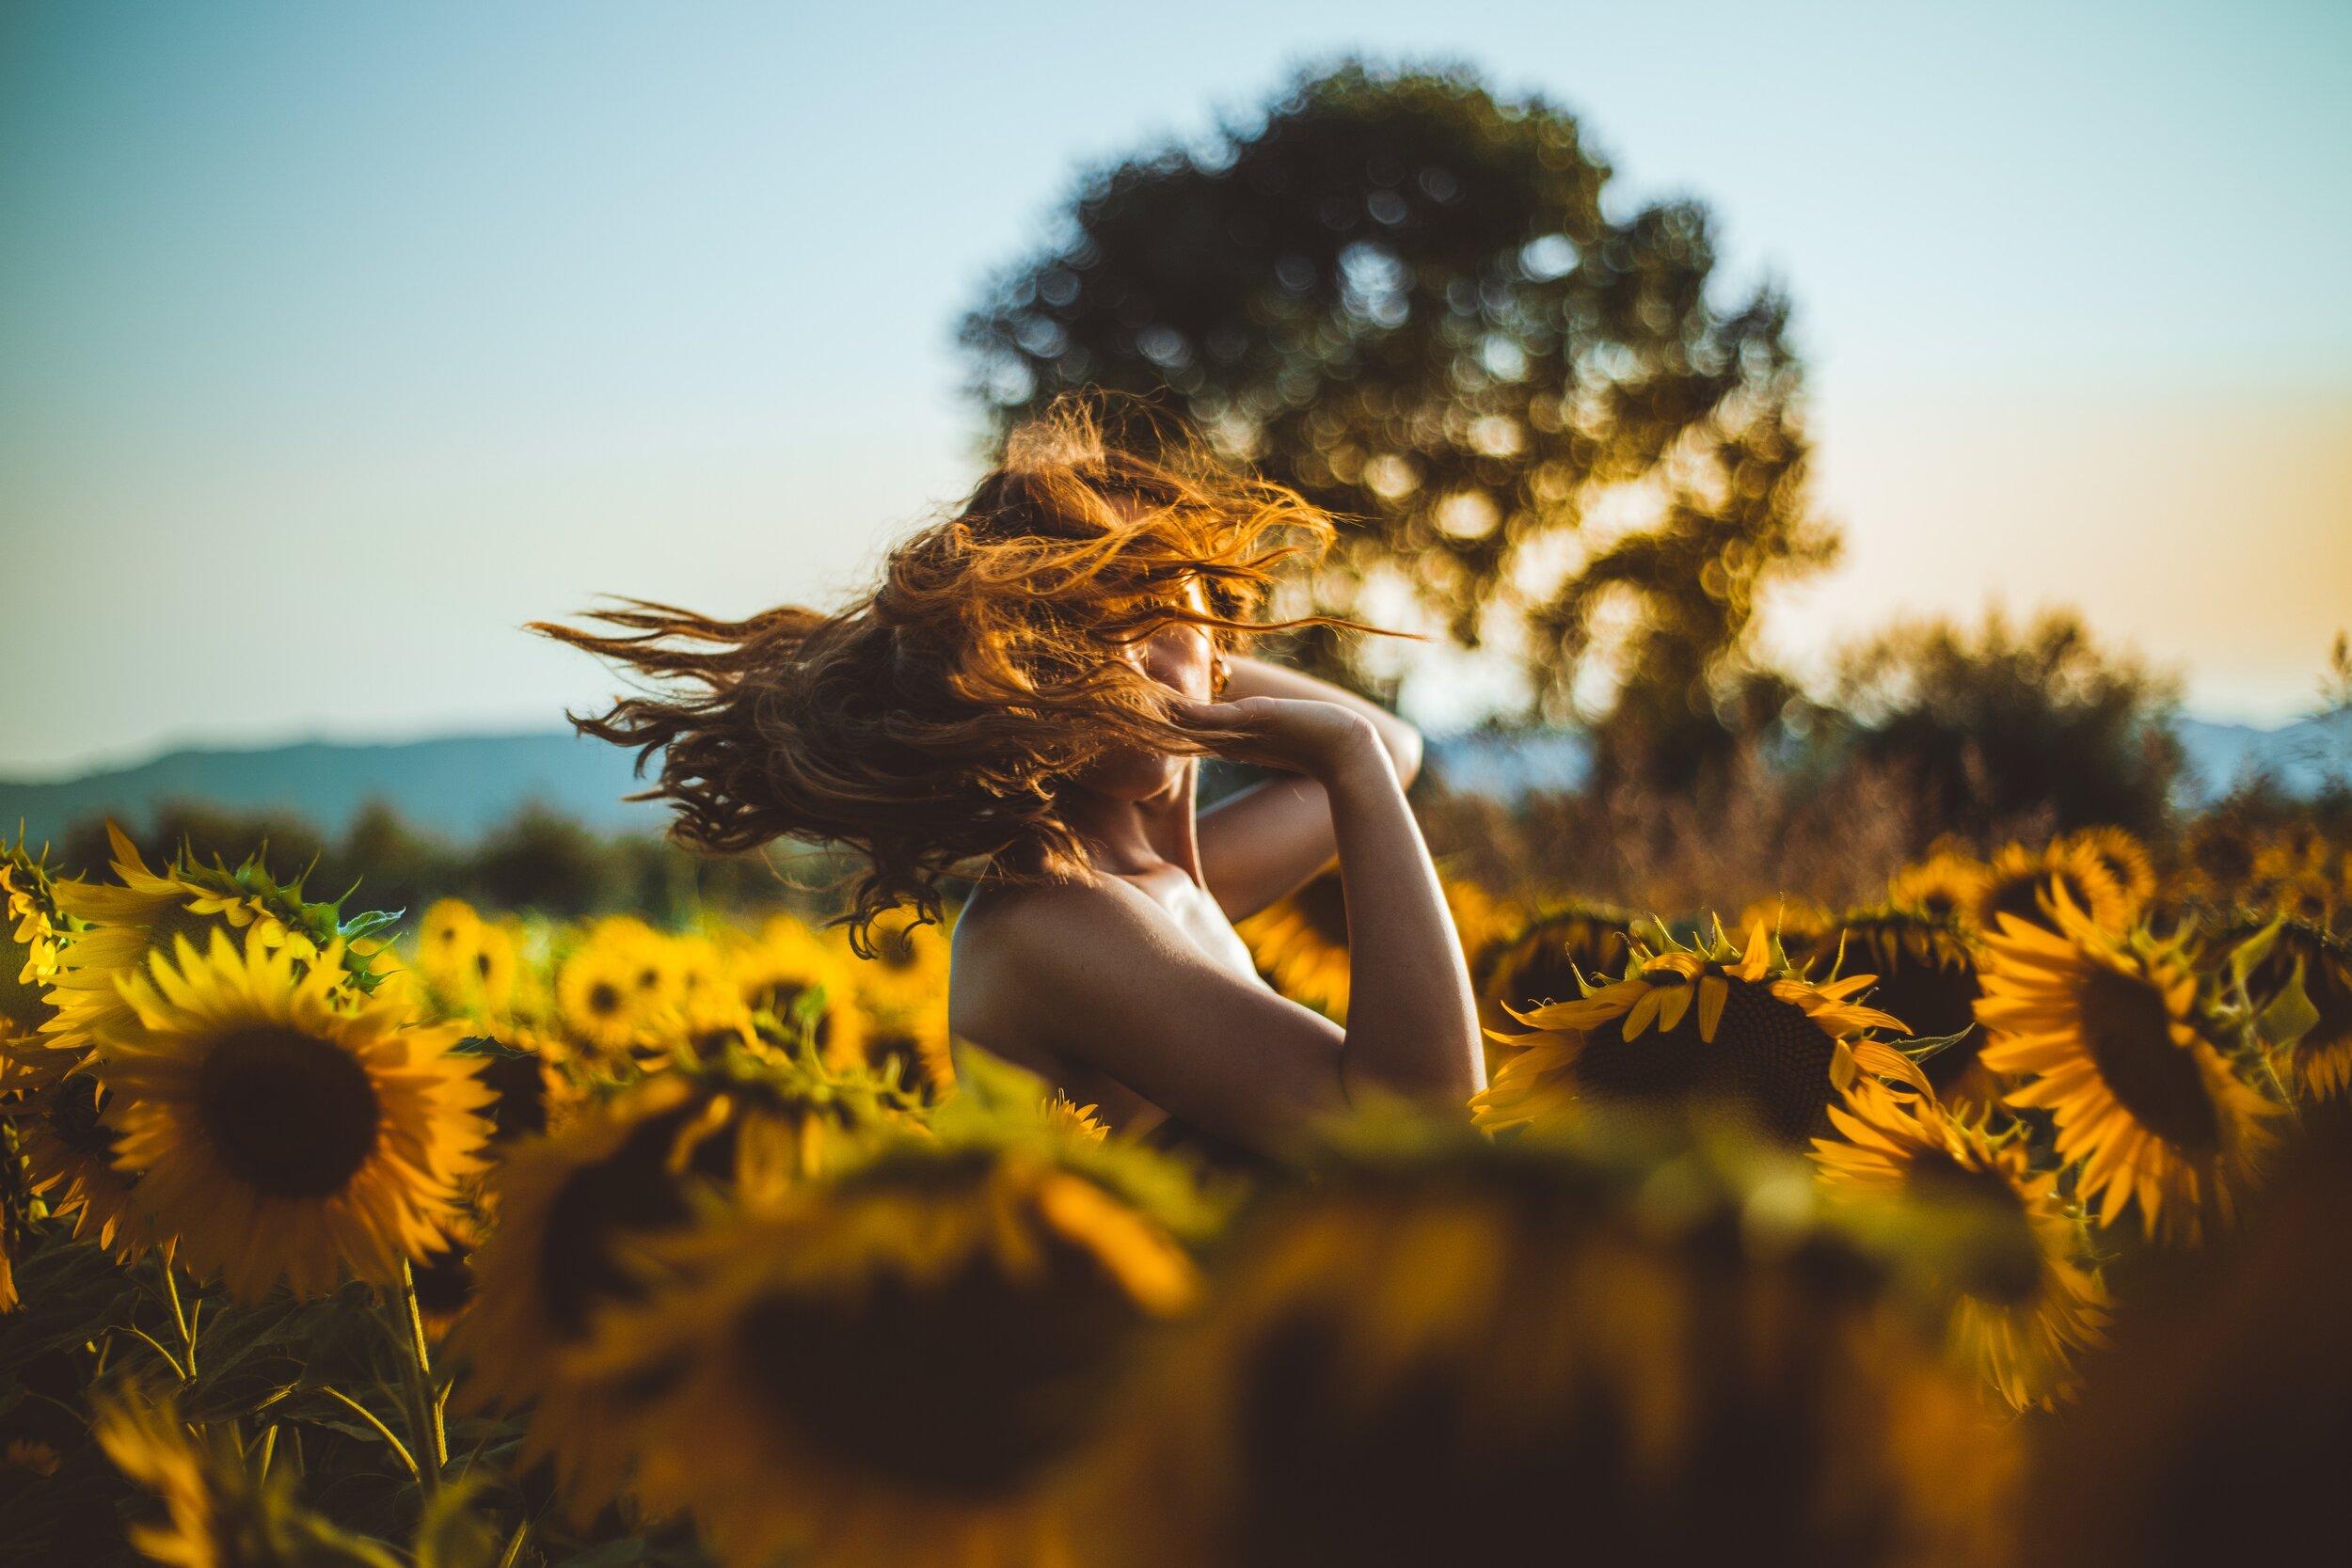 Sunflower Living: A Poem